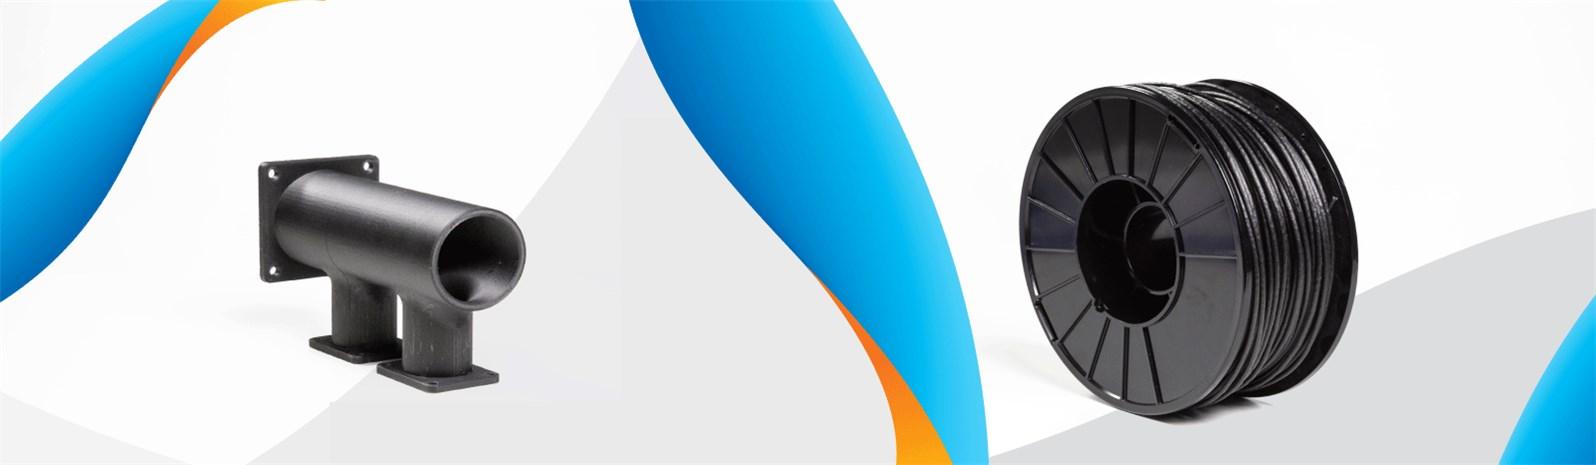 New portfolio will include innovative carbon fiber reinforced polypropylene filament for 3D printing